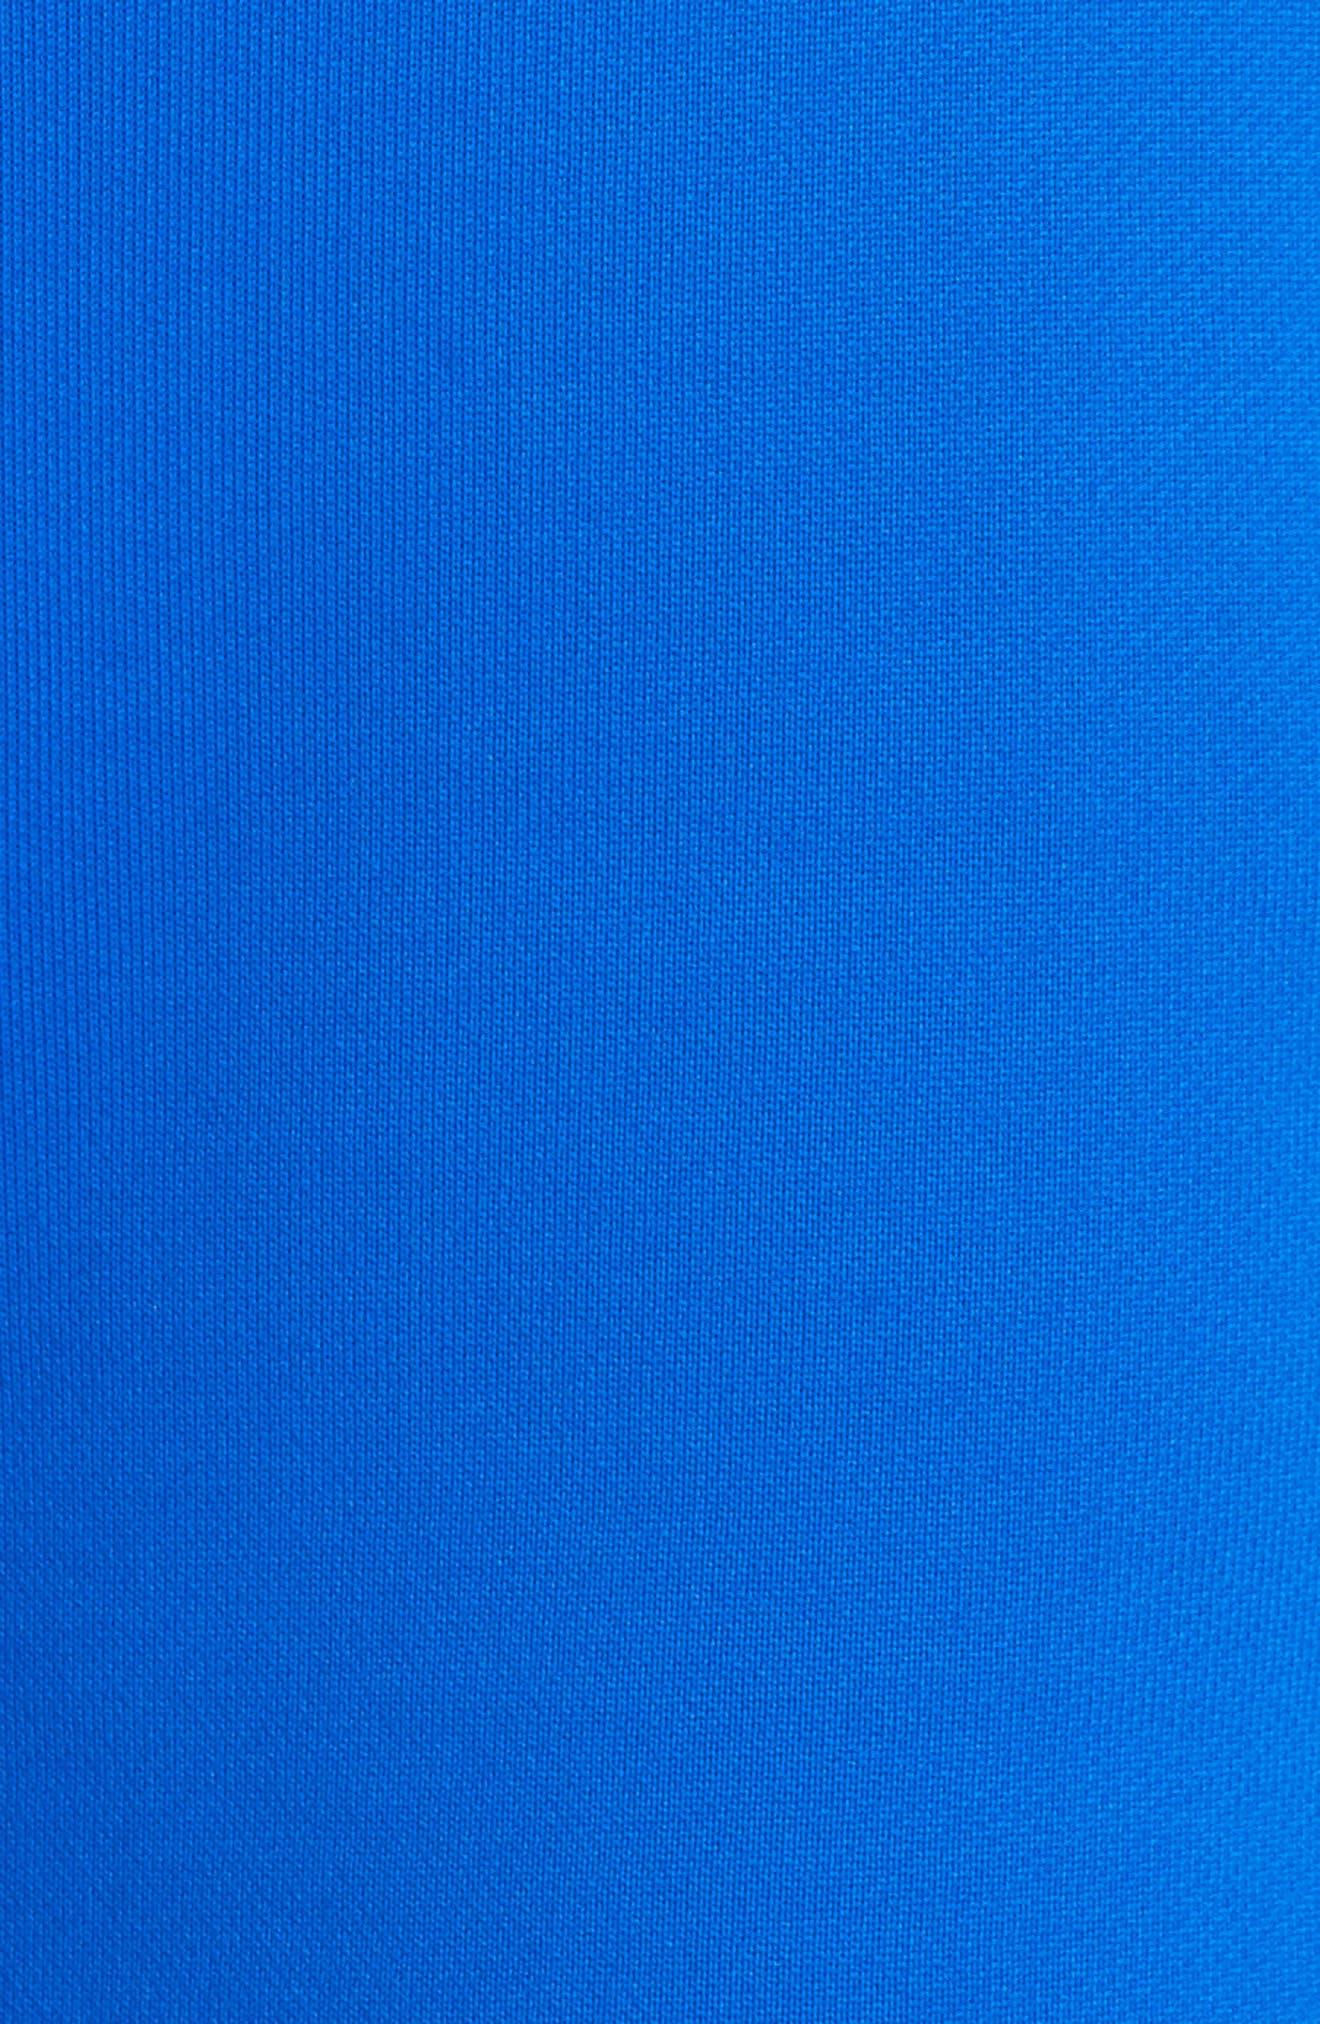 NikeLab Collection Women's Fleece Shorts,                             Alternate thumbnail 6, color,                             Hyper Cobalt/ Black